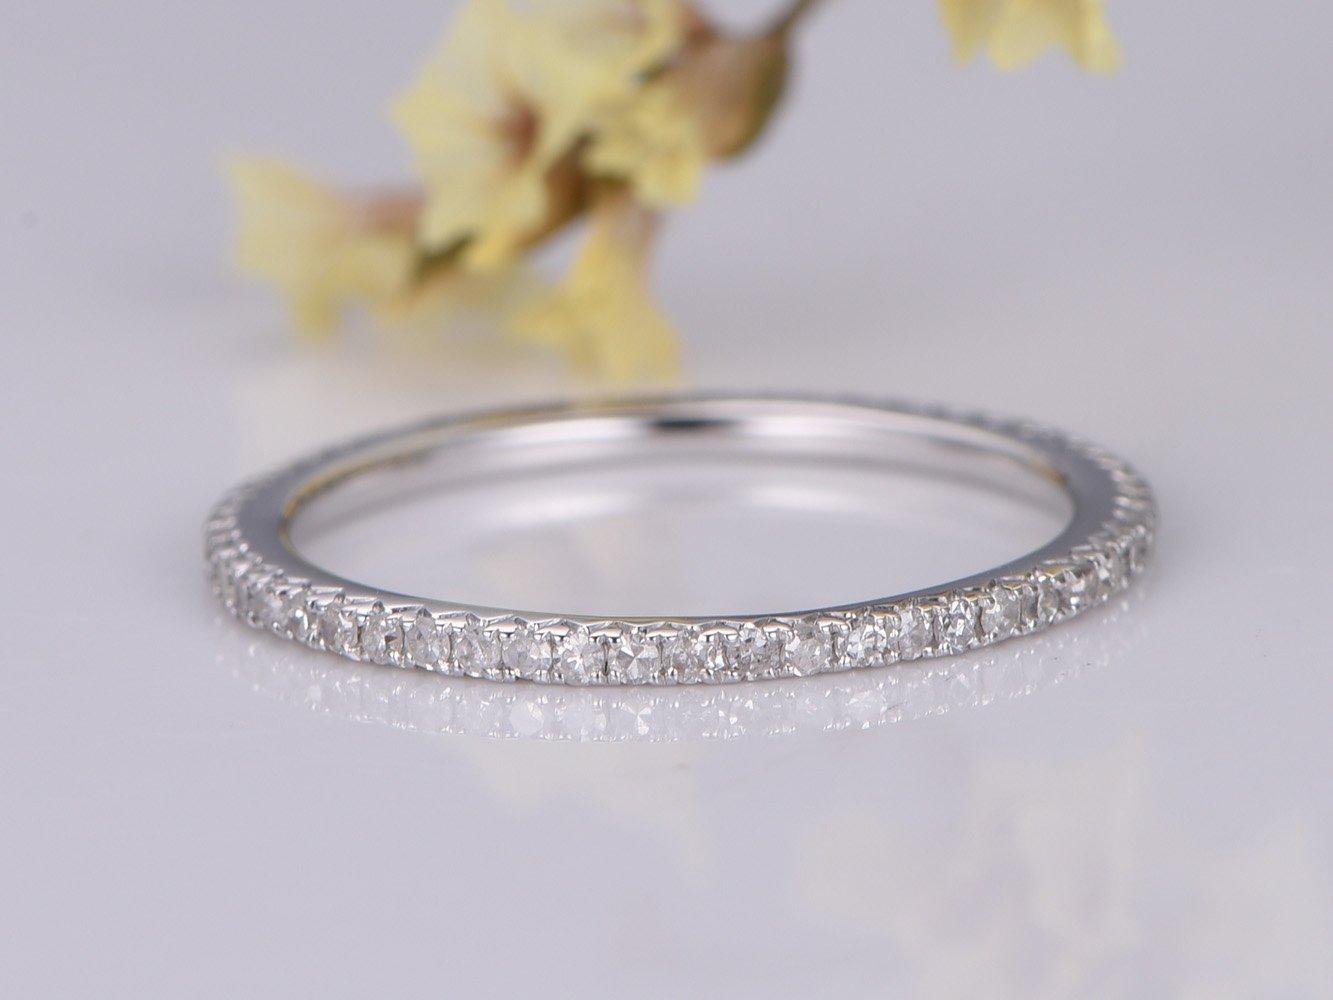 French V Pave Diamond Wedding Band Solid 14k White Gold Full Eternity Engagement Ring Bridal Promise Ring Stack Matching Band